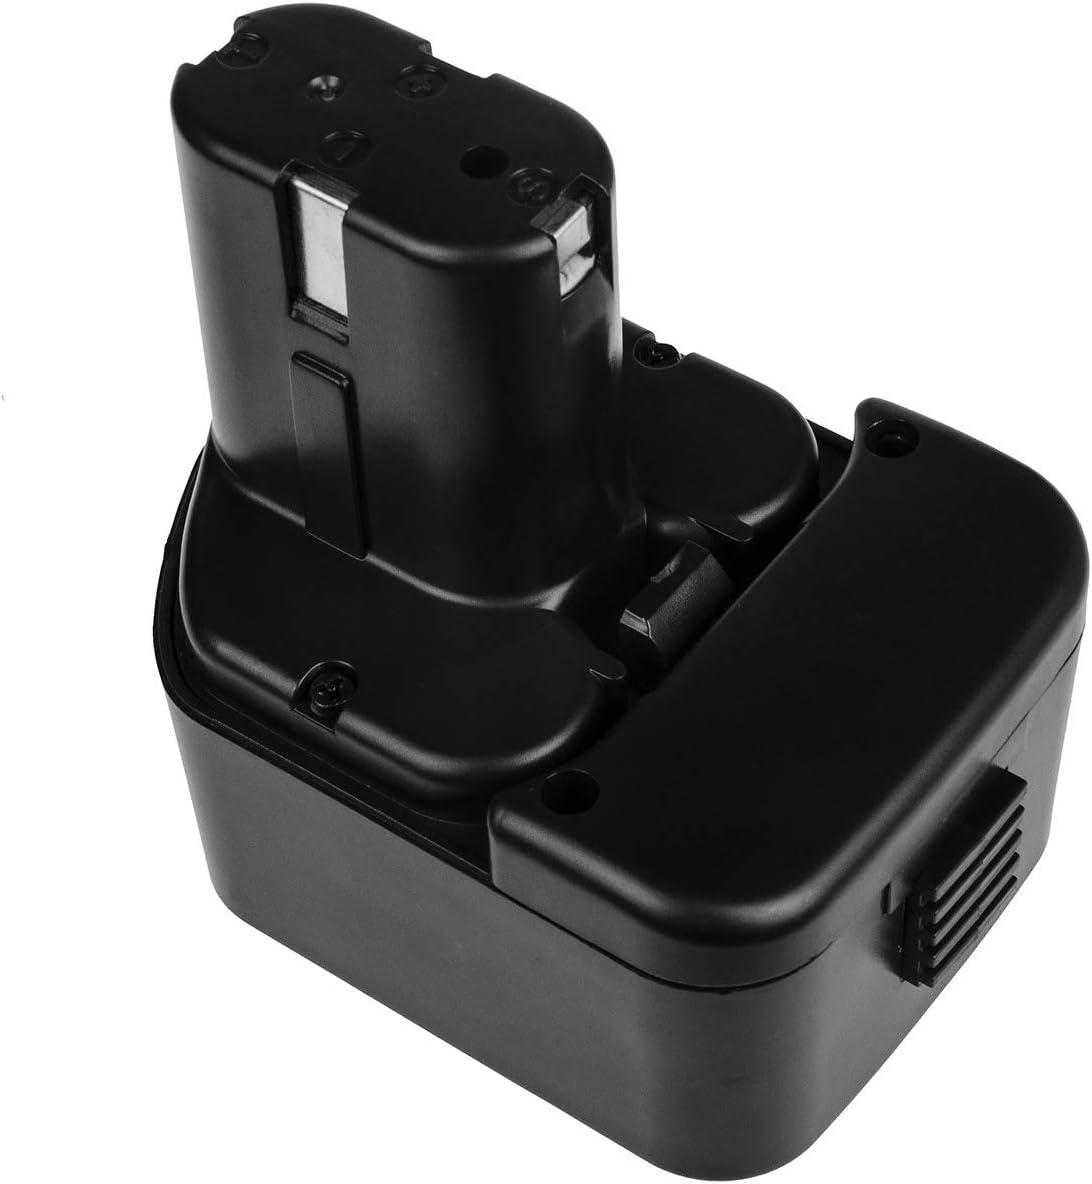 EB914 Batteria per Hitachi Utensili Elettrici 2Ah 9.6V Ni-MH pile GC/®